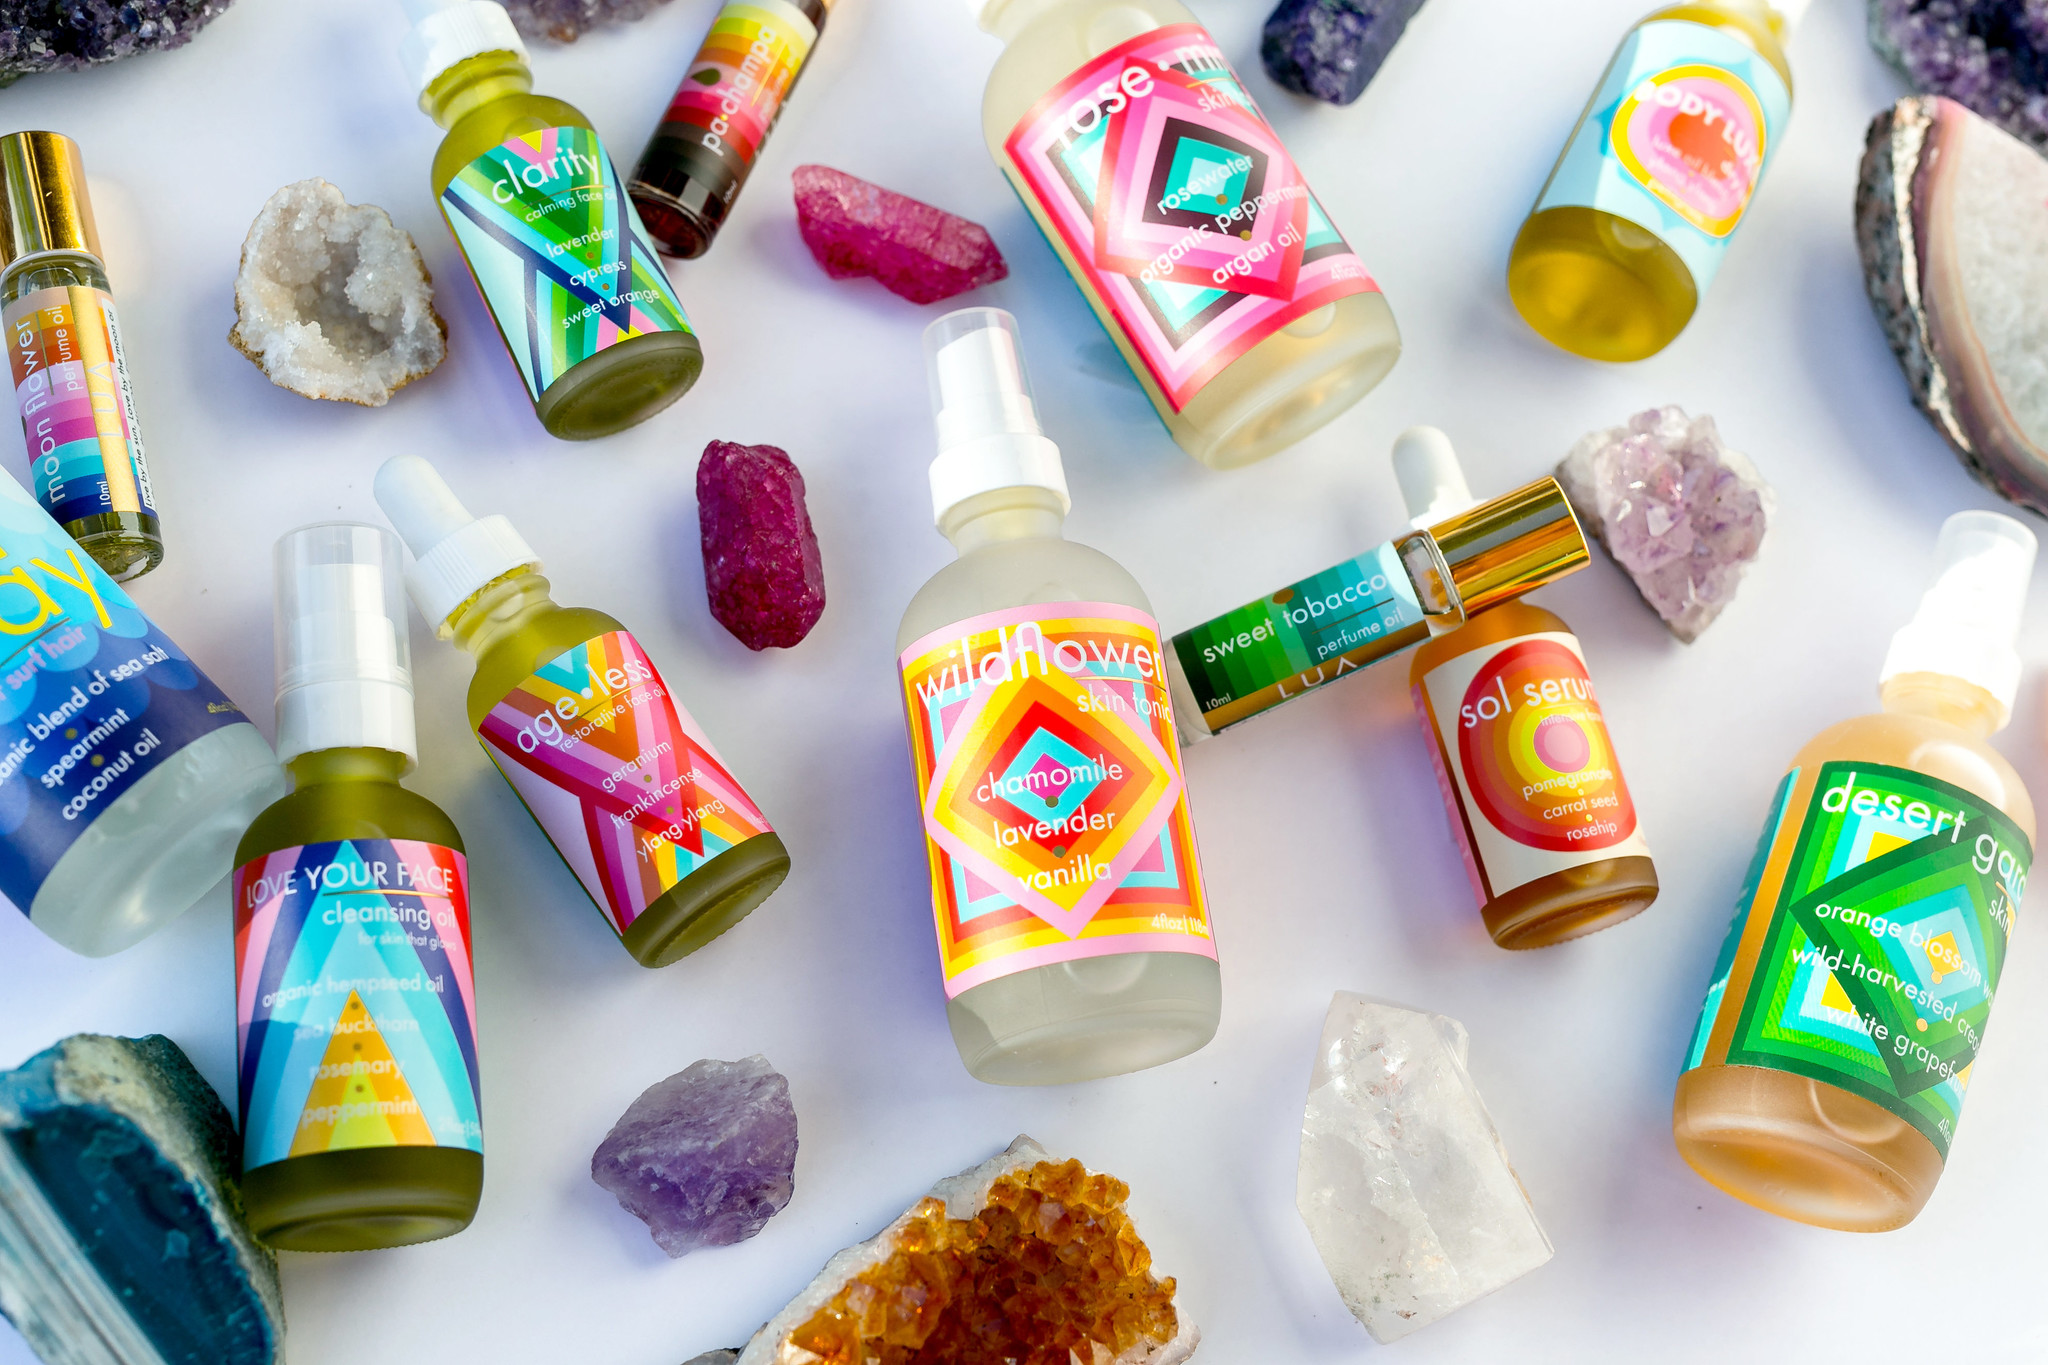 Lua Skincare Vegan Skincare Products Skincare Routine